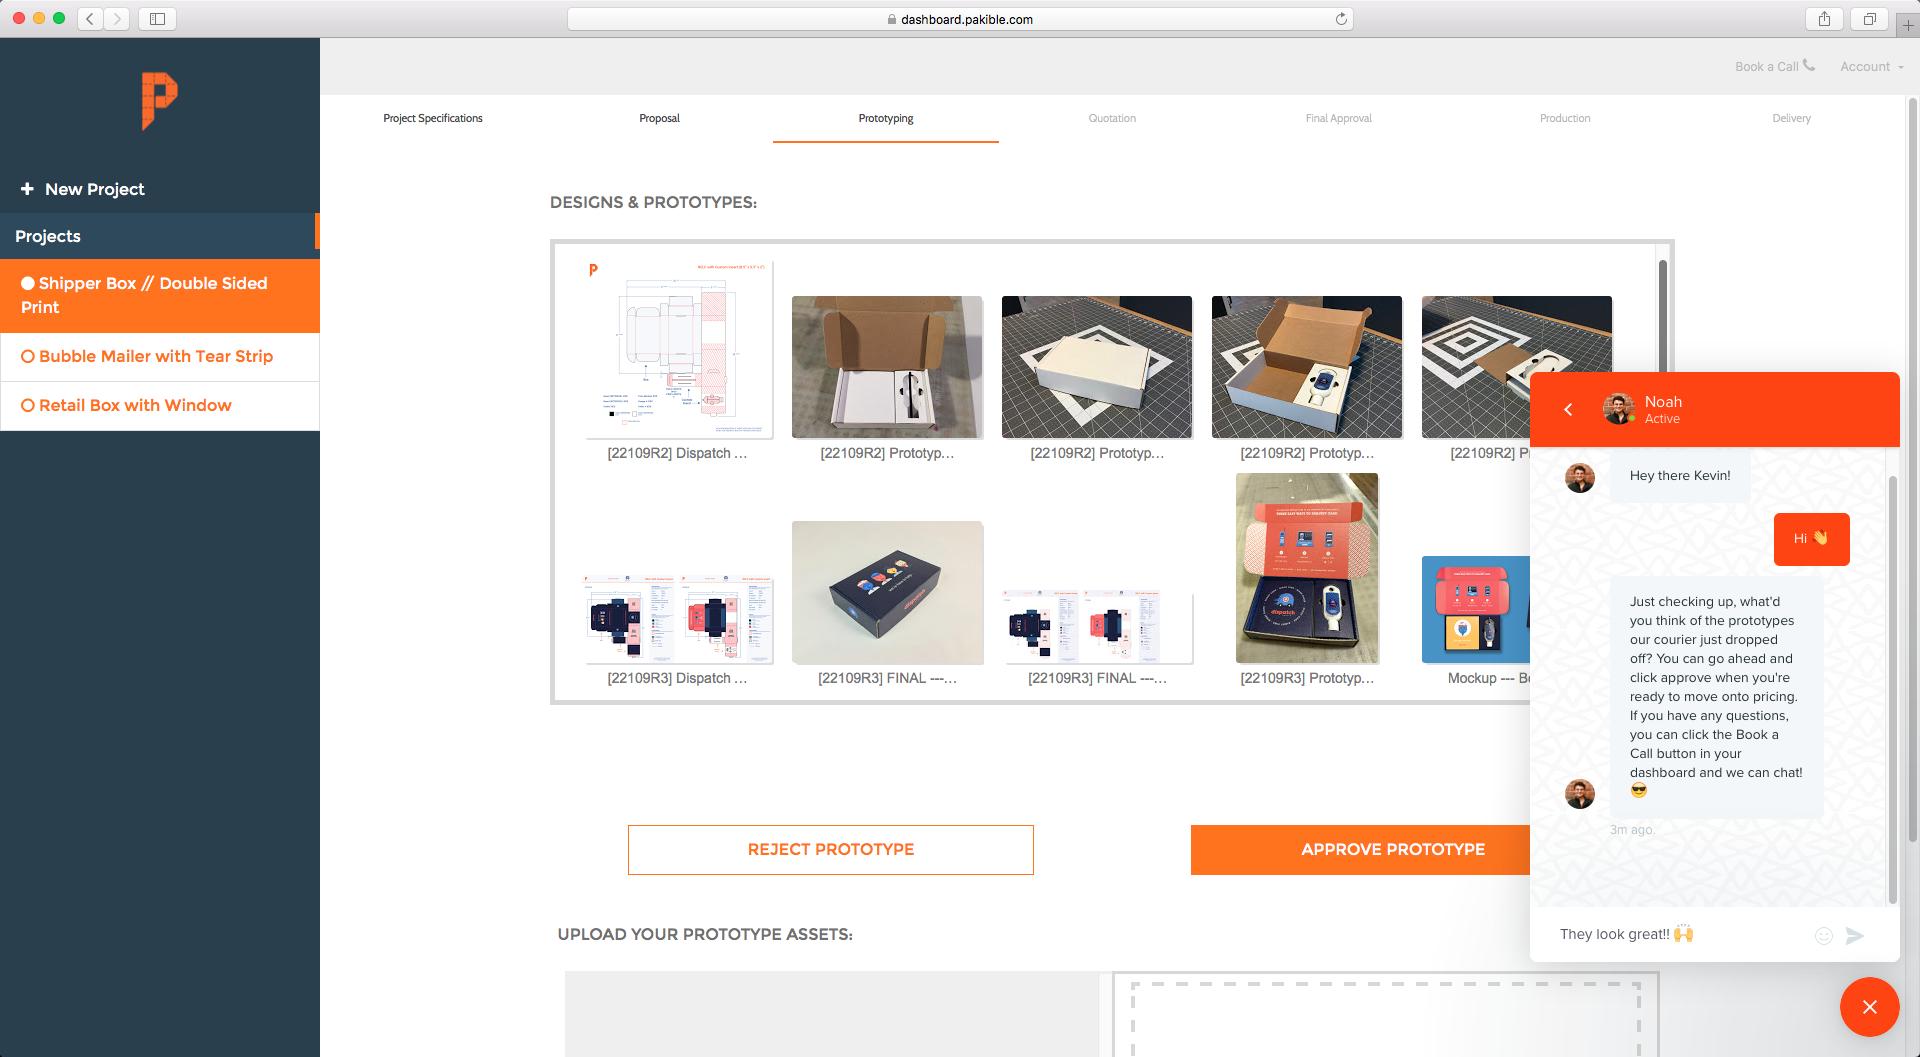 DASHBOARD-03-Prototyping-Mailer-Box-Insert